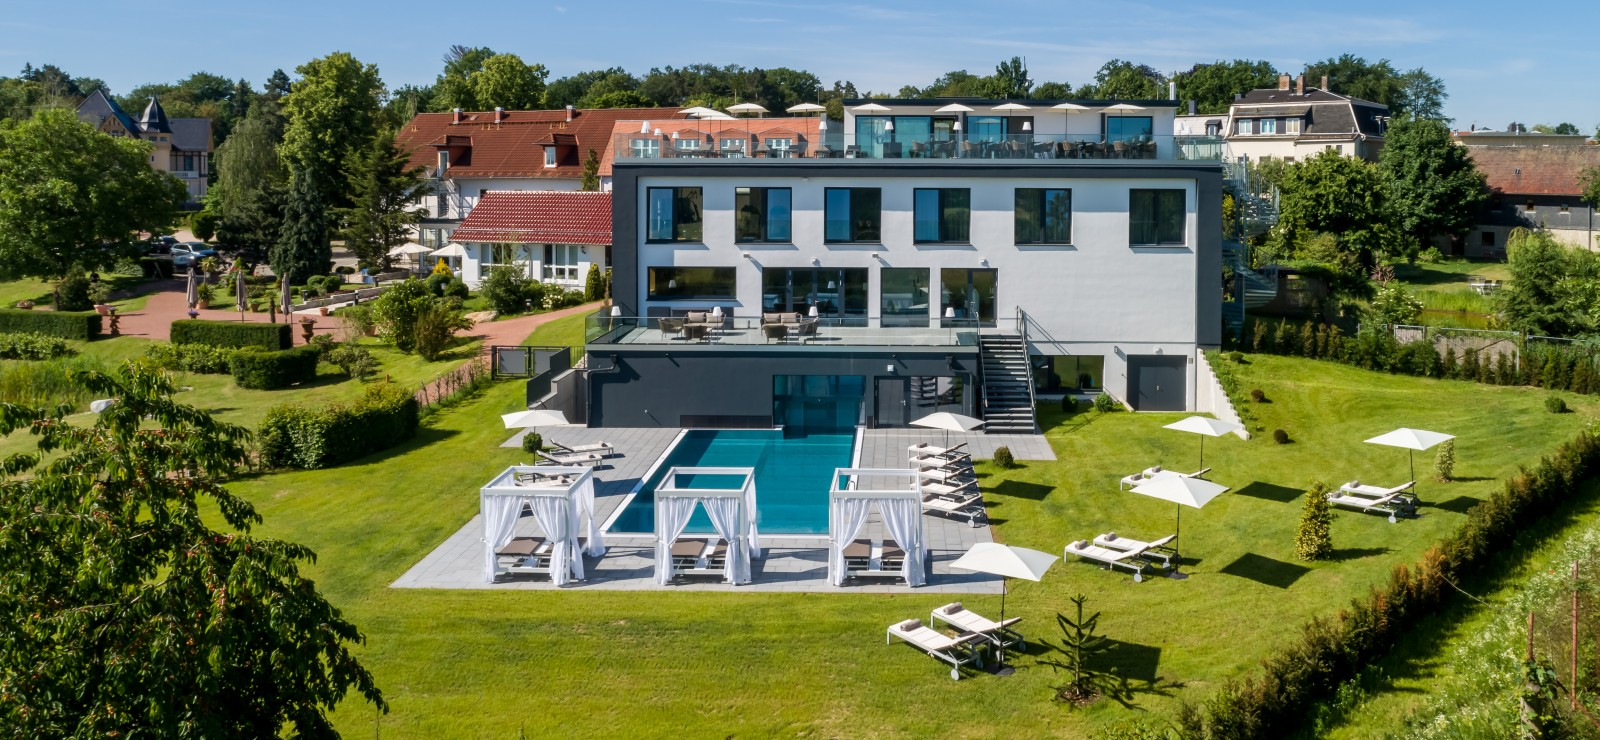 Romantik Hotel Schwanefeld Bilder | Bild 1